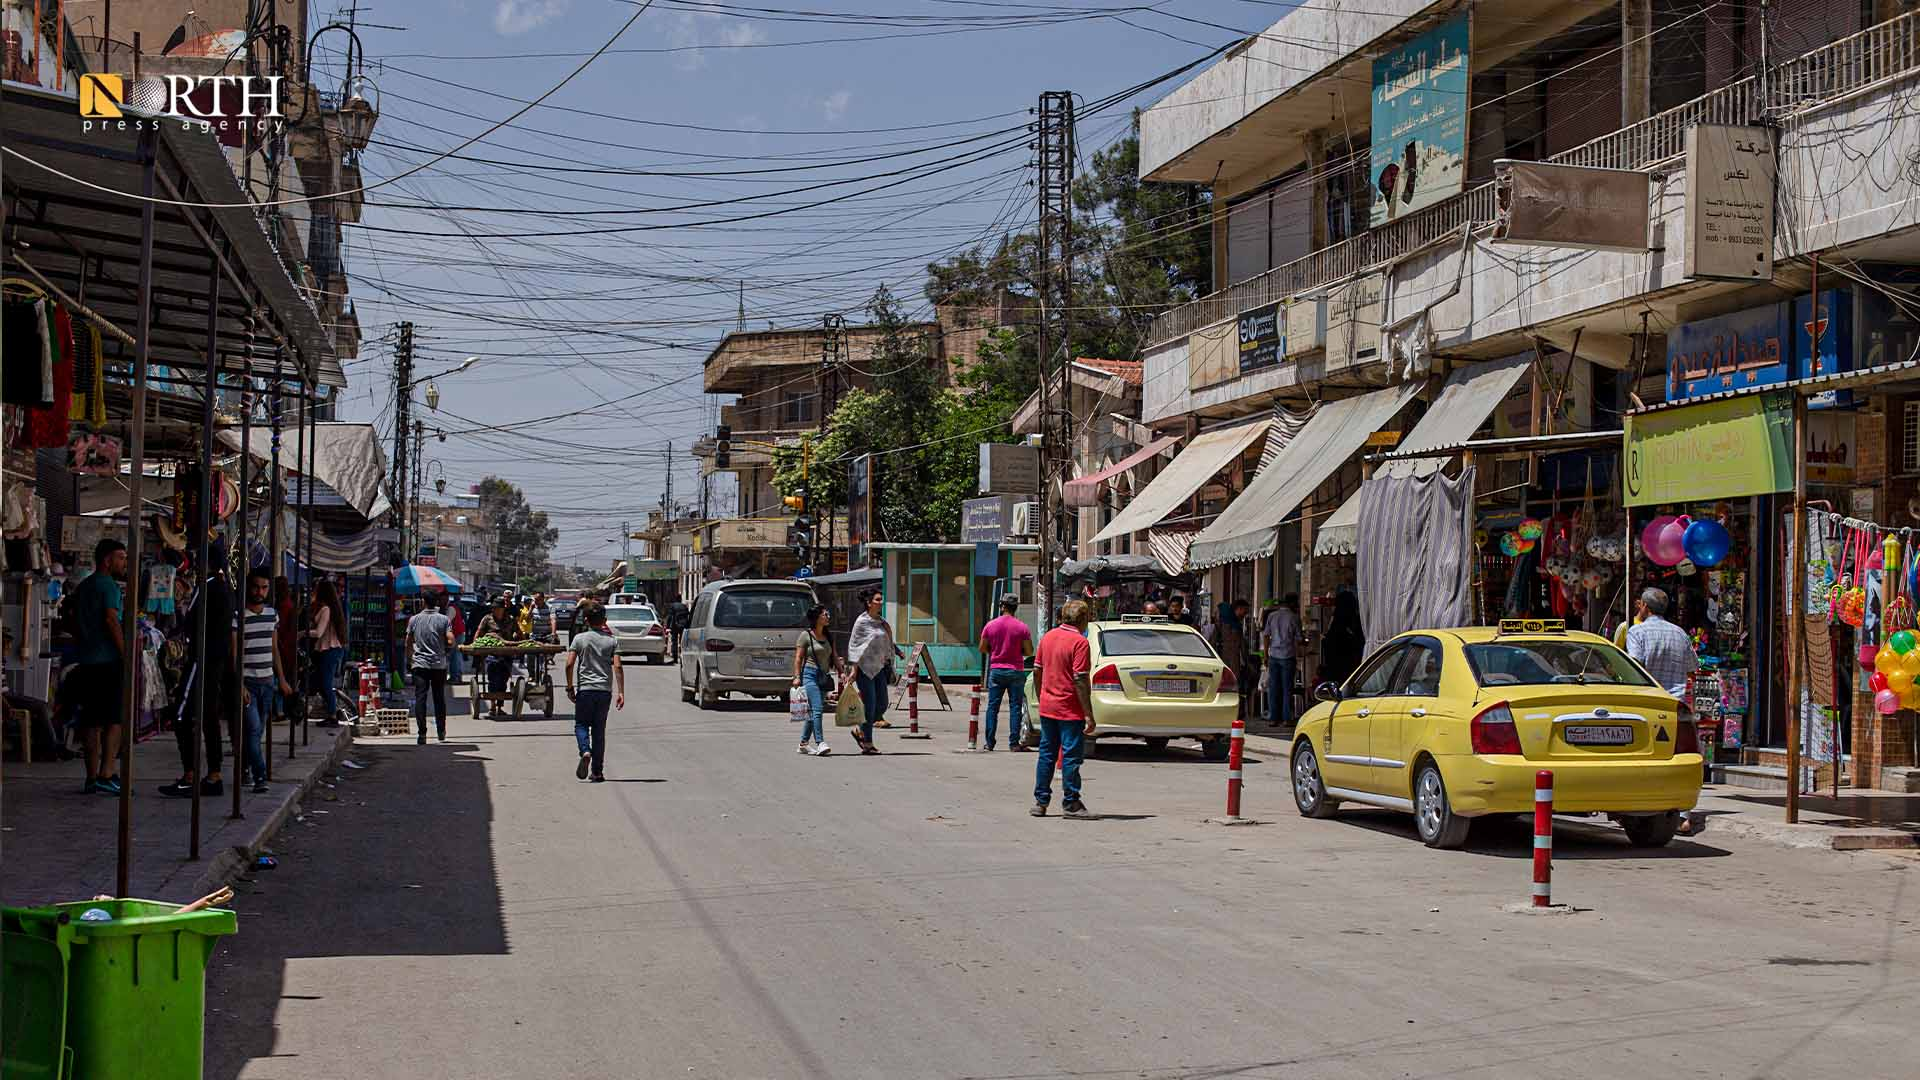 Municipality Street in the city of Qamishli – North Press